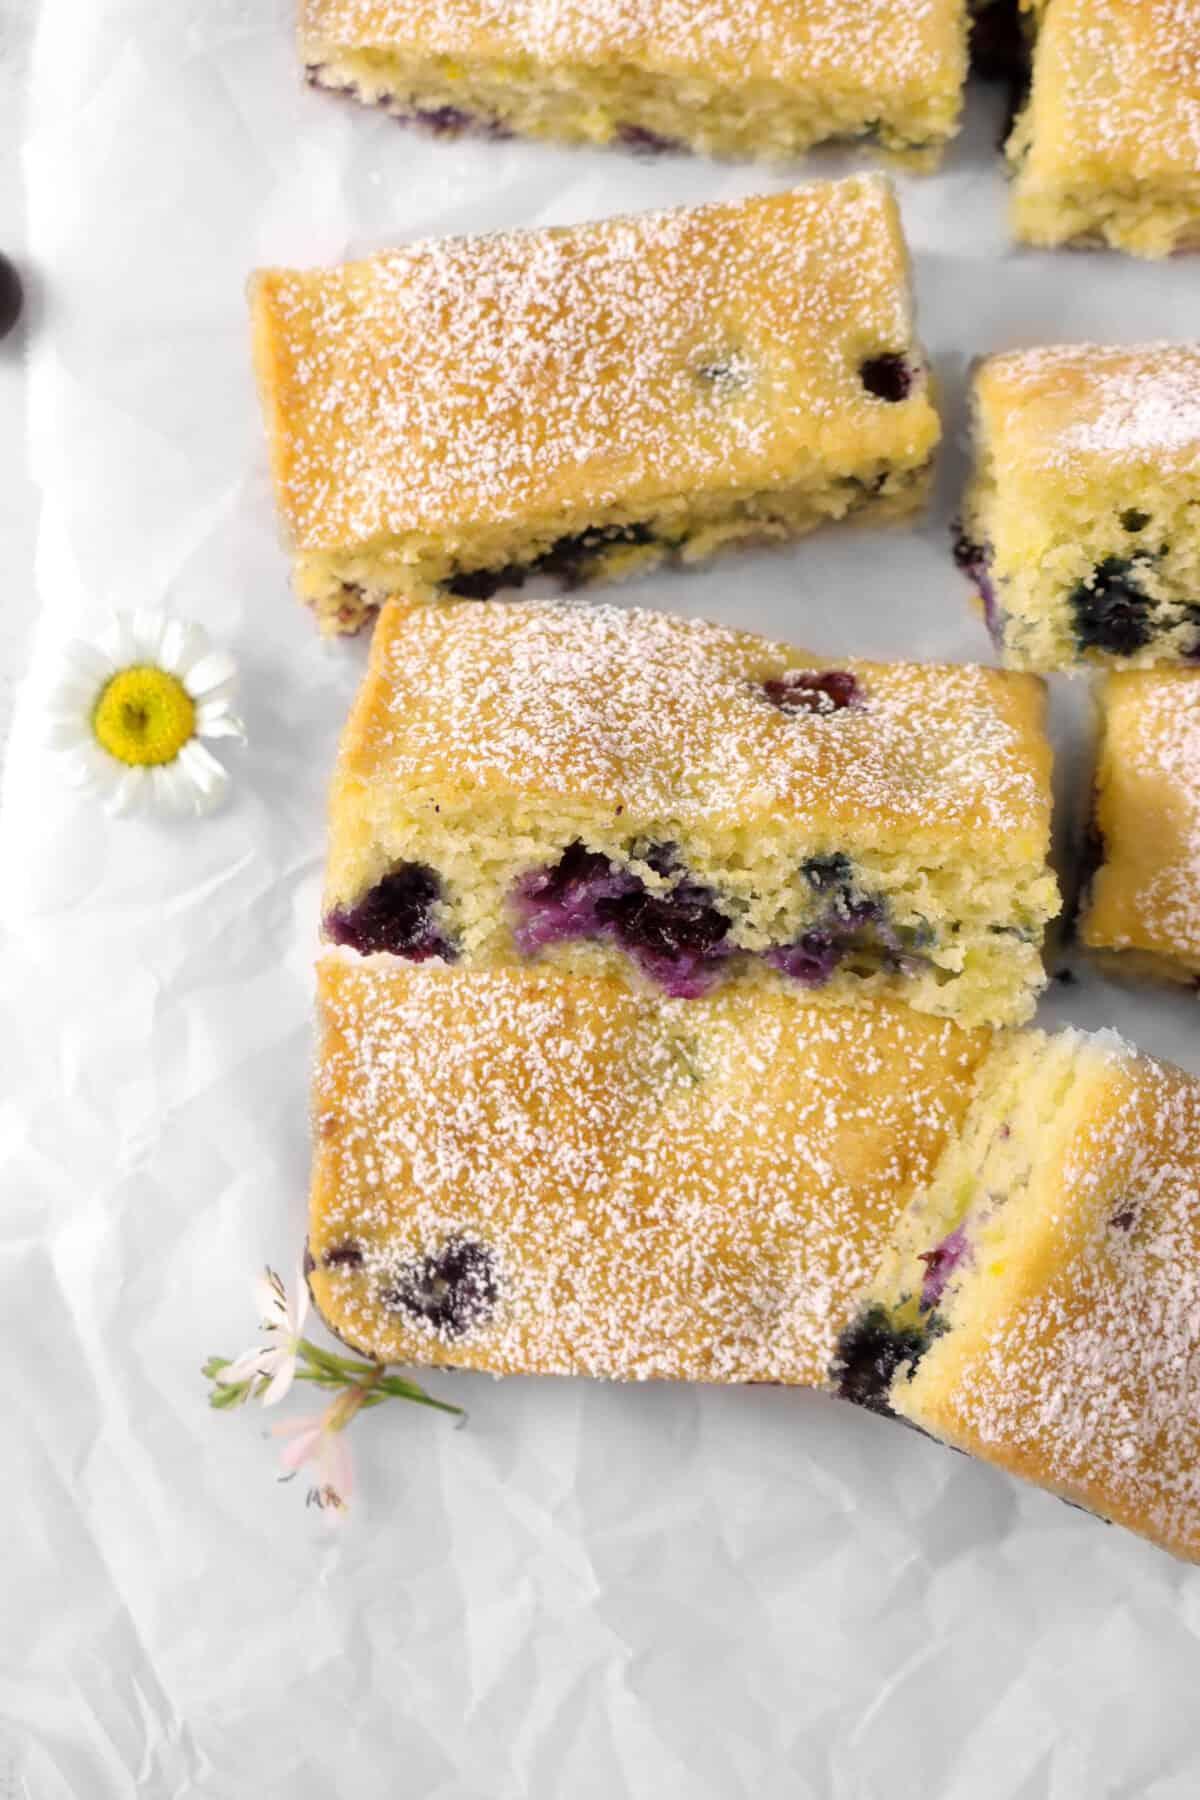 Lemon Blueberry Snack Cake slices with fresh flowers